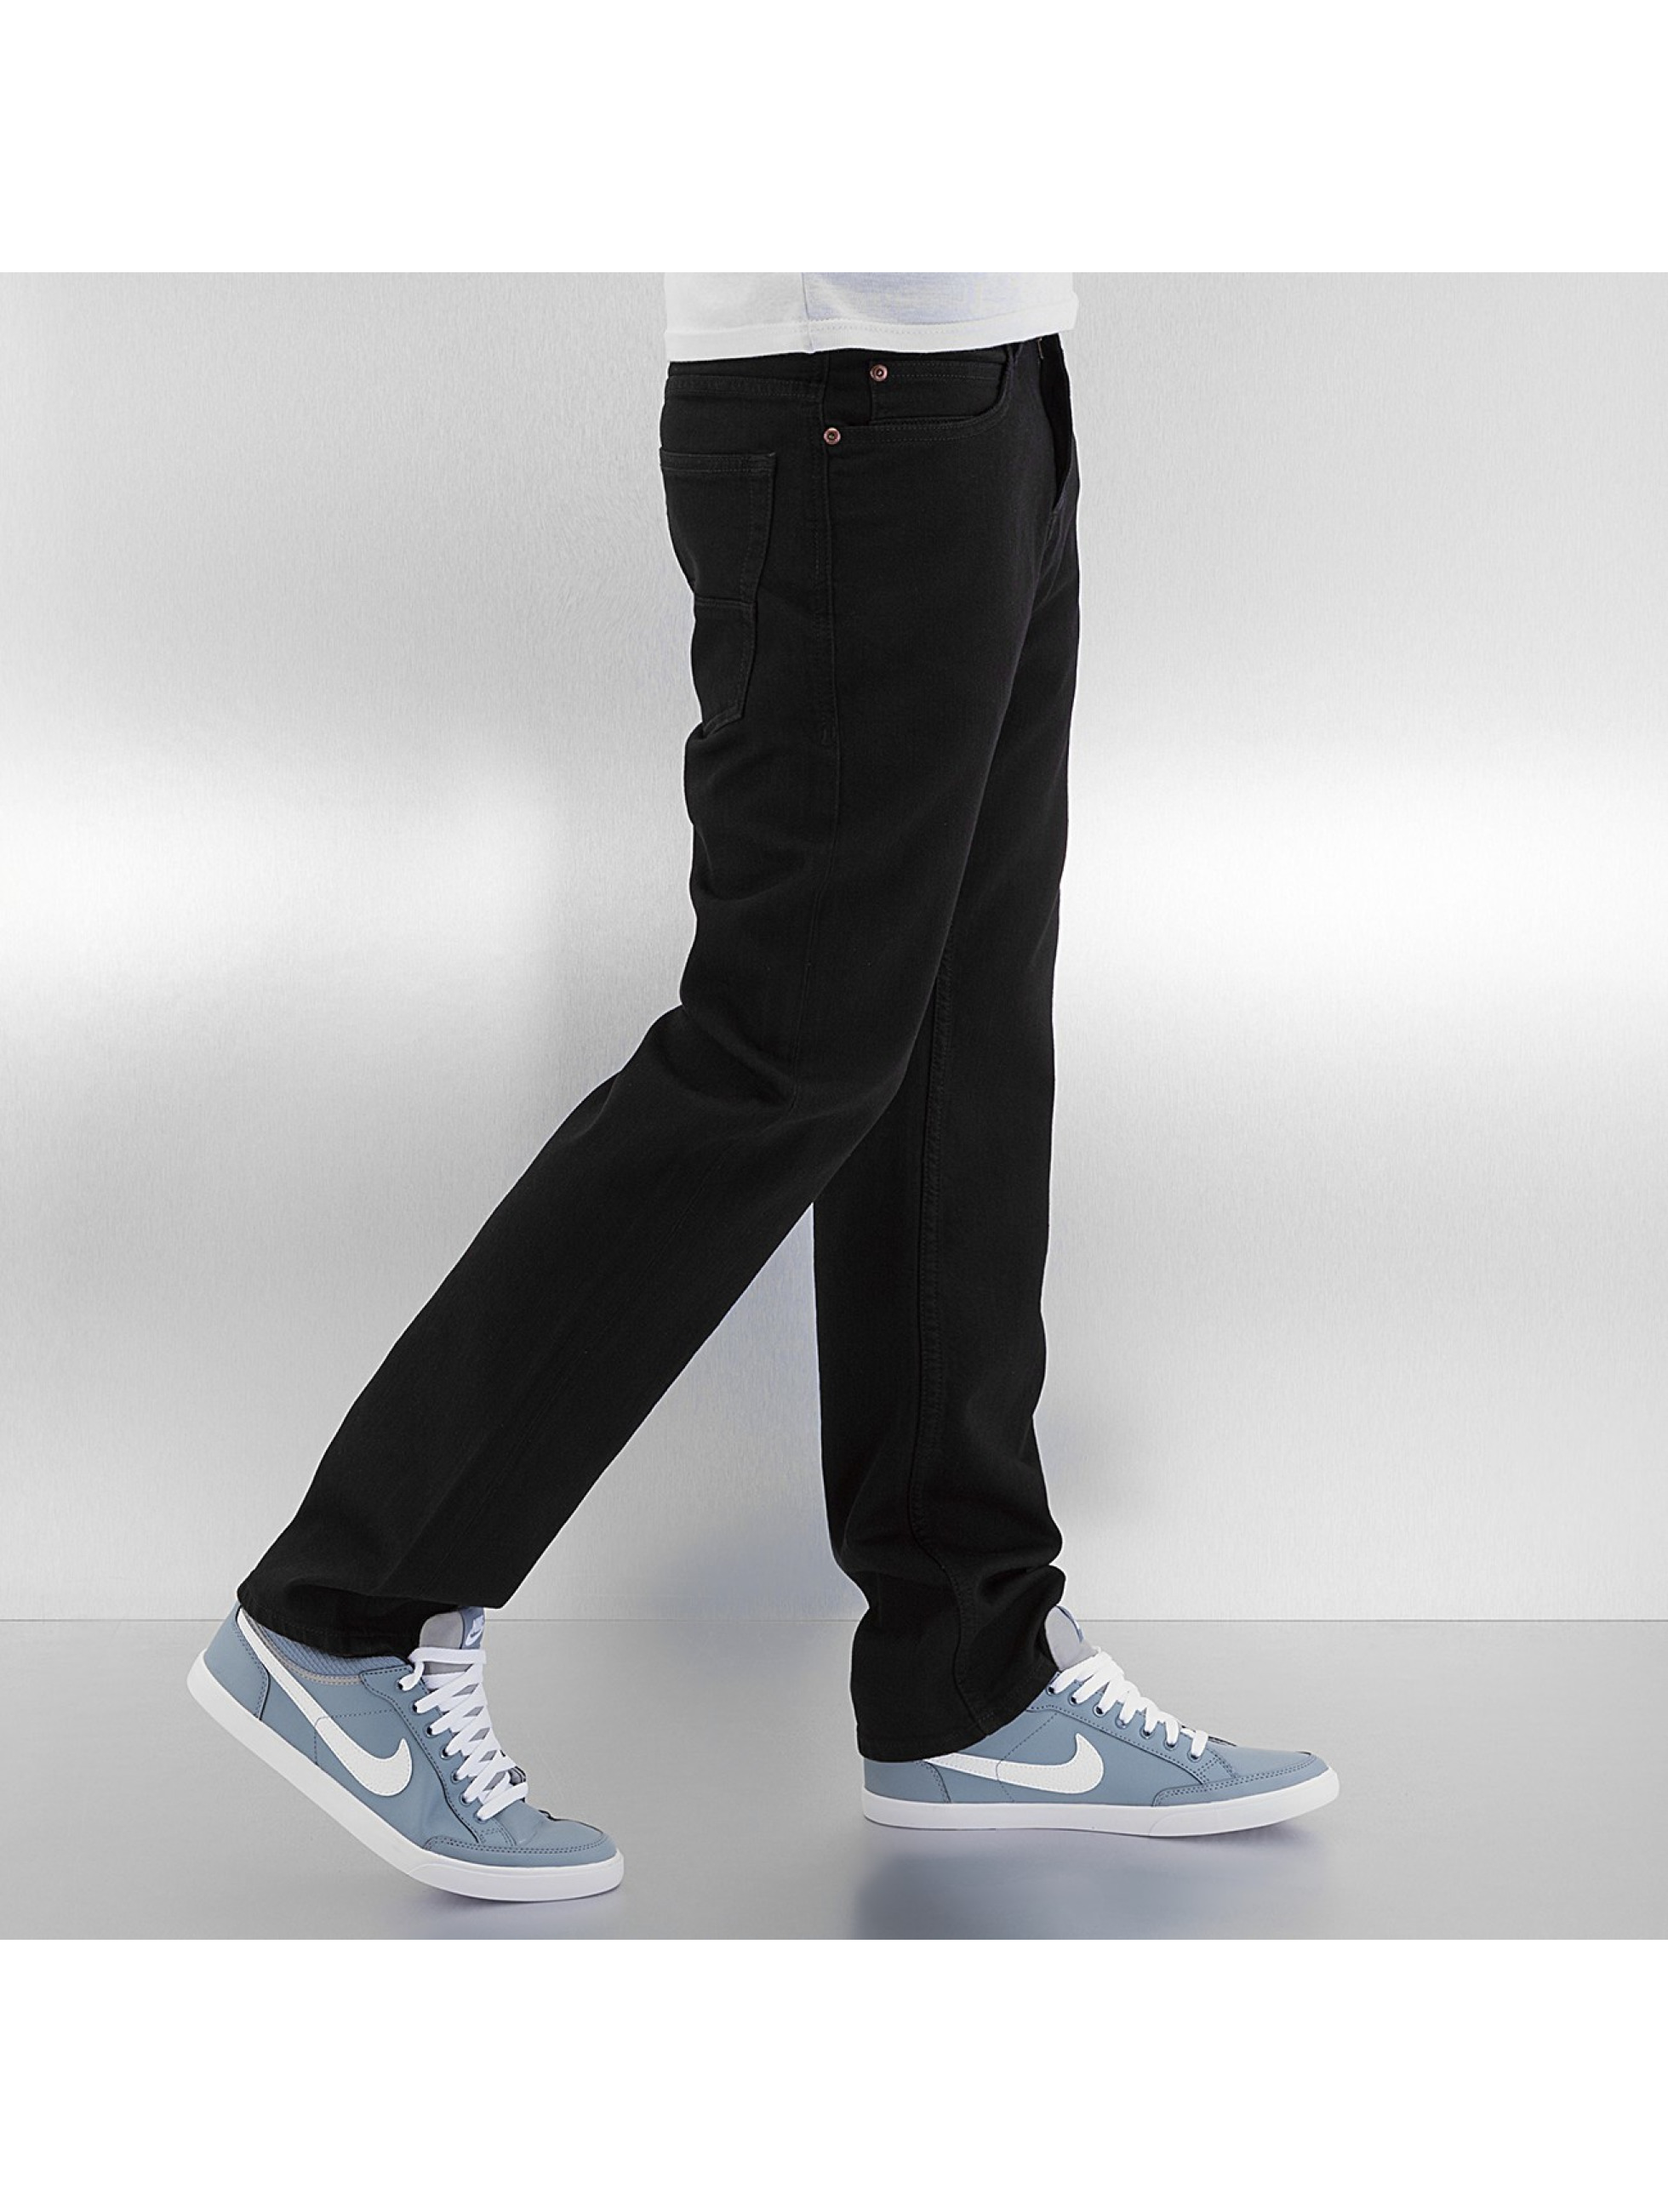 Pelle Pelle Loose Fit Jeans Baxter Denim schwarz